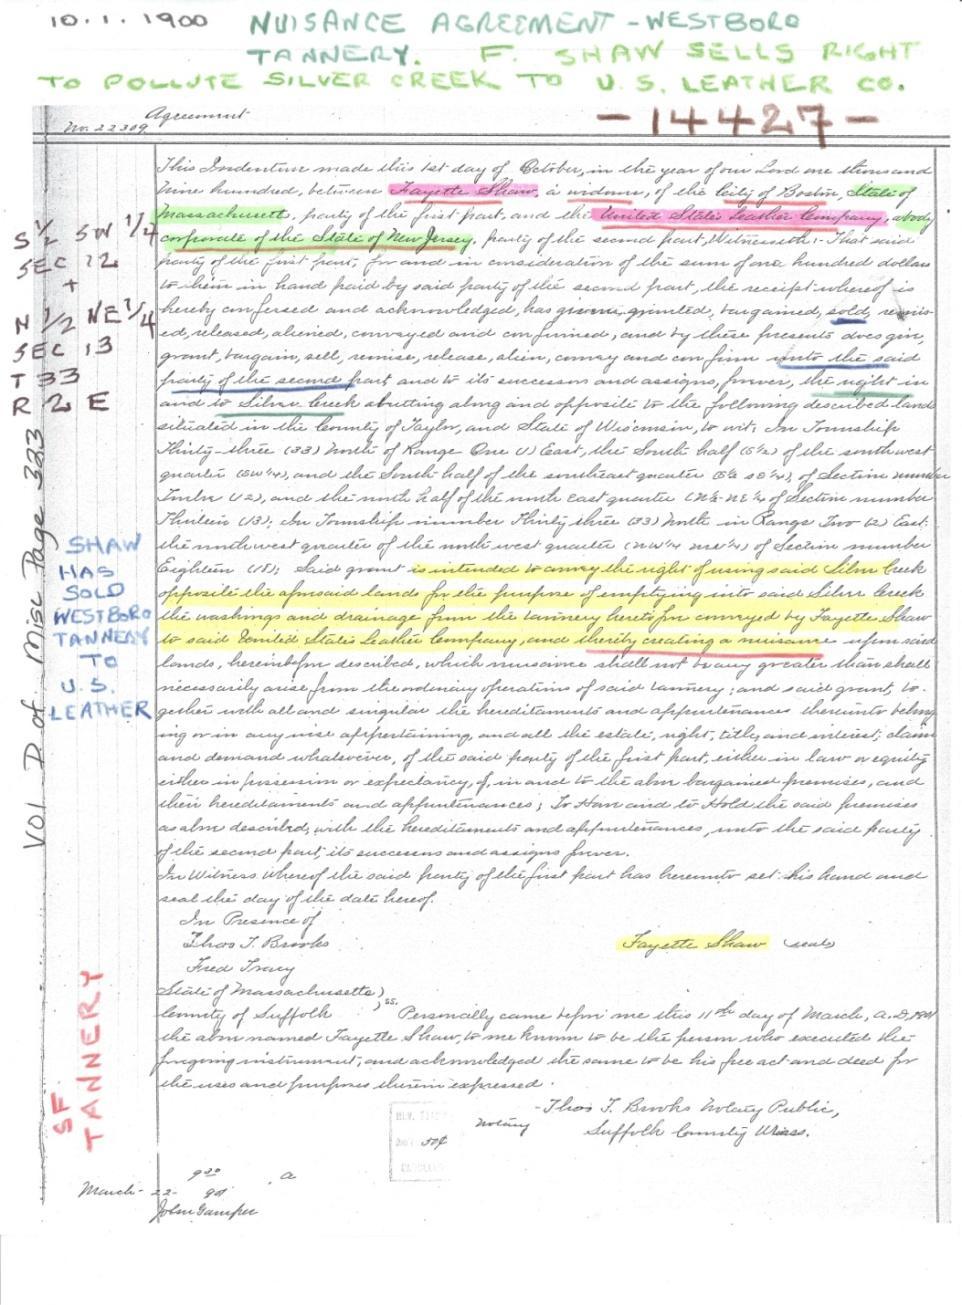 C:\Users\Robert P. Rusch\Desktop\II. RLHSoc\Documents & Photos-Scanned\Rib Lake History 14400-14499\14427-10-1-1900 nuisance agreement for Westboro Tannery.jpg